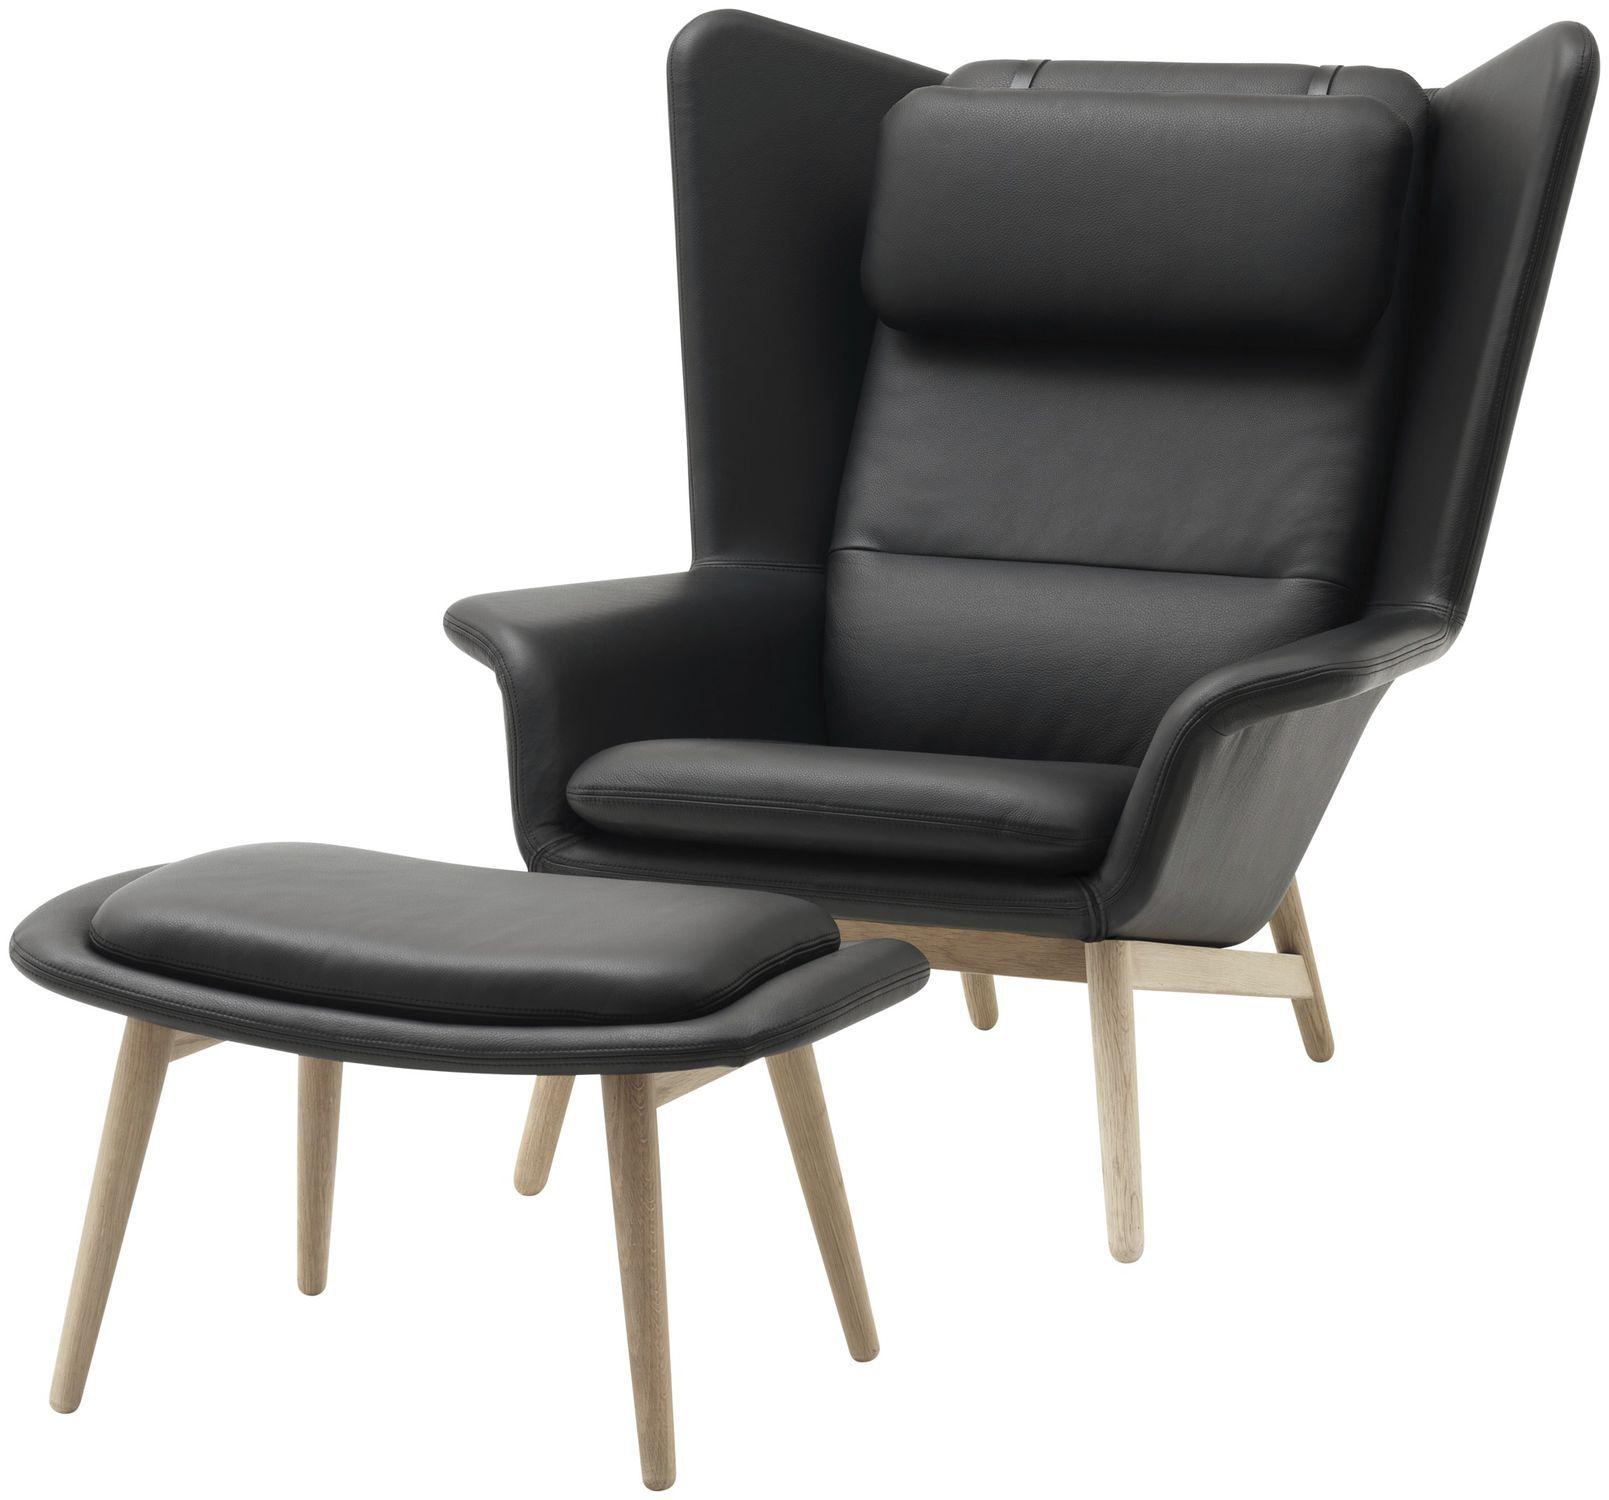 Contemporary Armchair / Wooden / Fabric / Leather intérieur Bo Concept Fauteuil